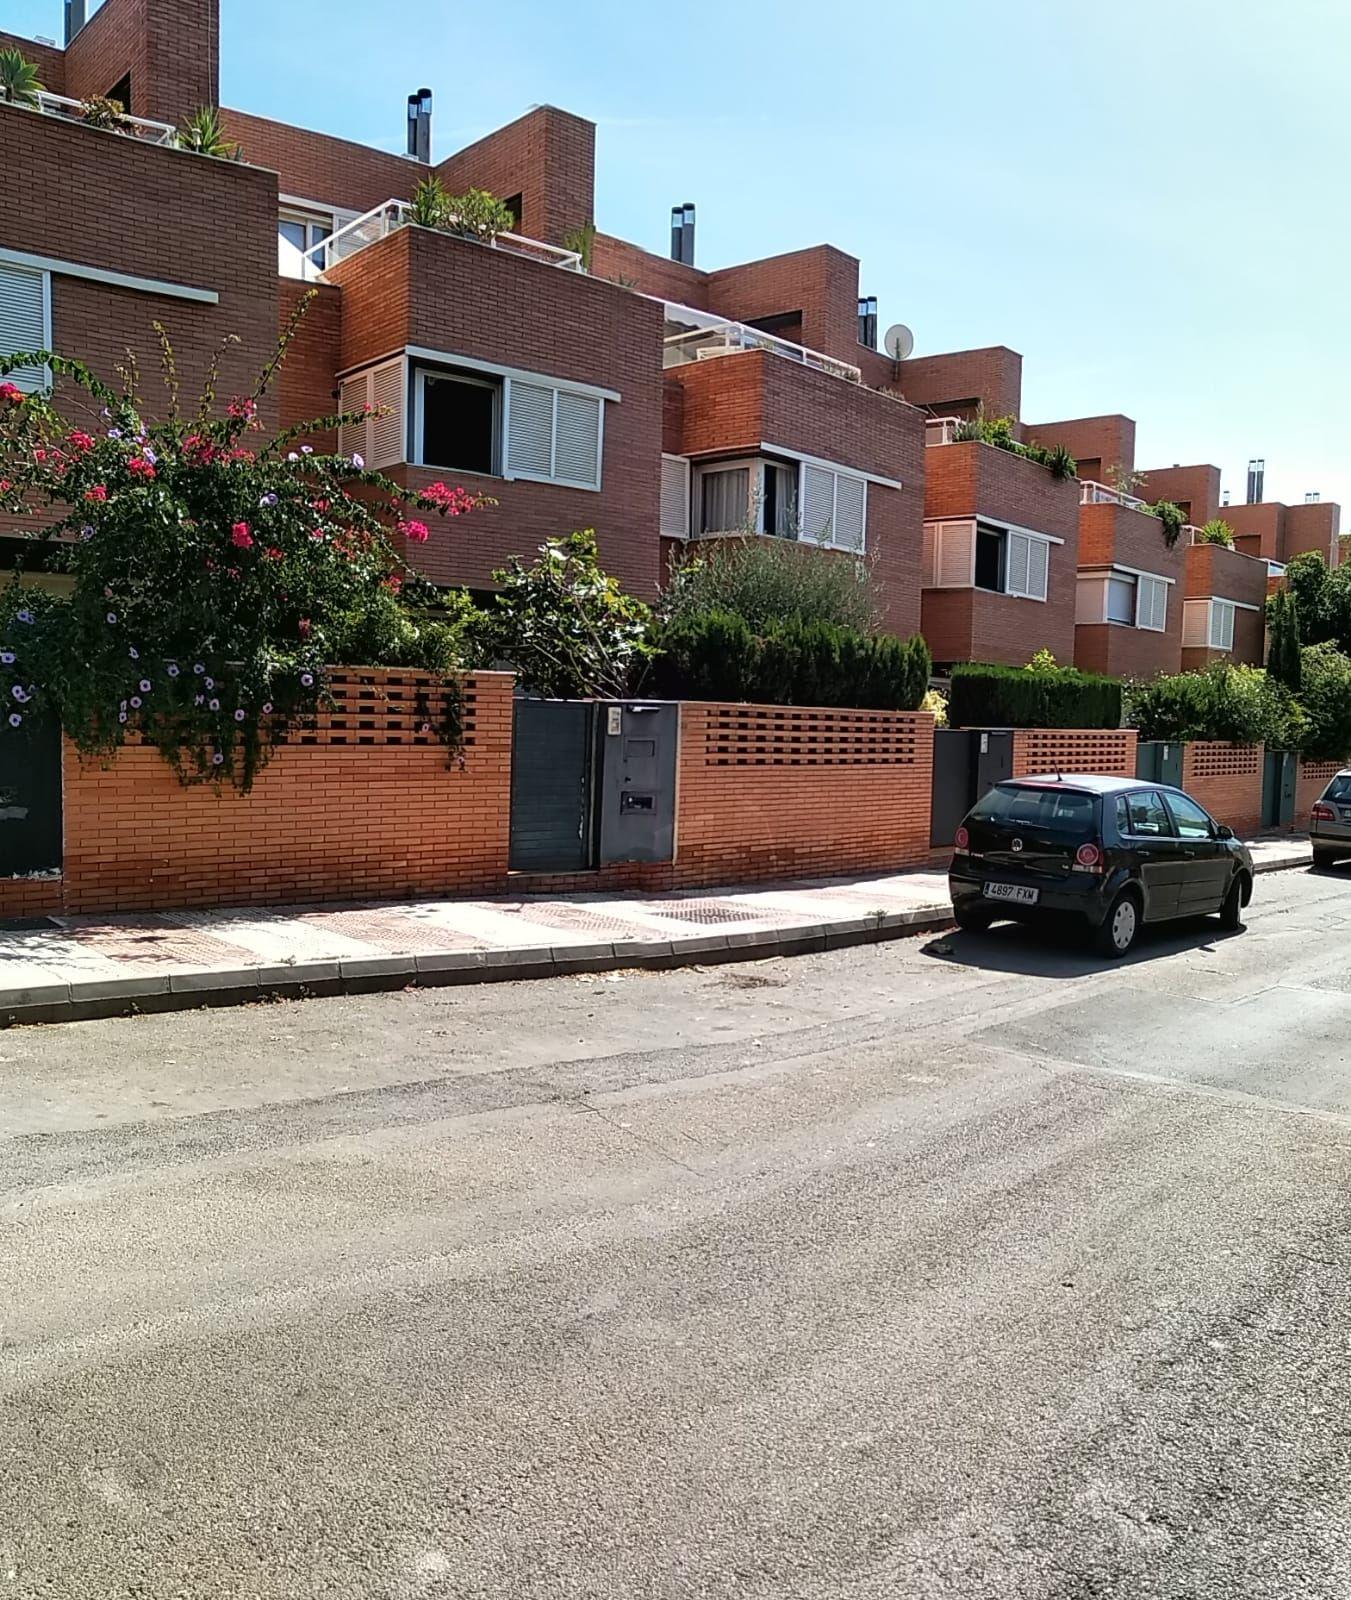 Triplex en Roquetas de Mar, Aguadulce sur, venta